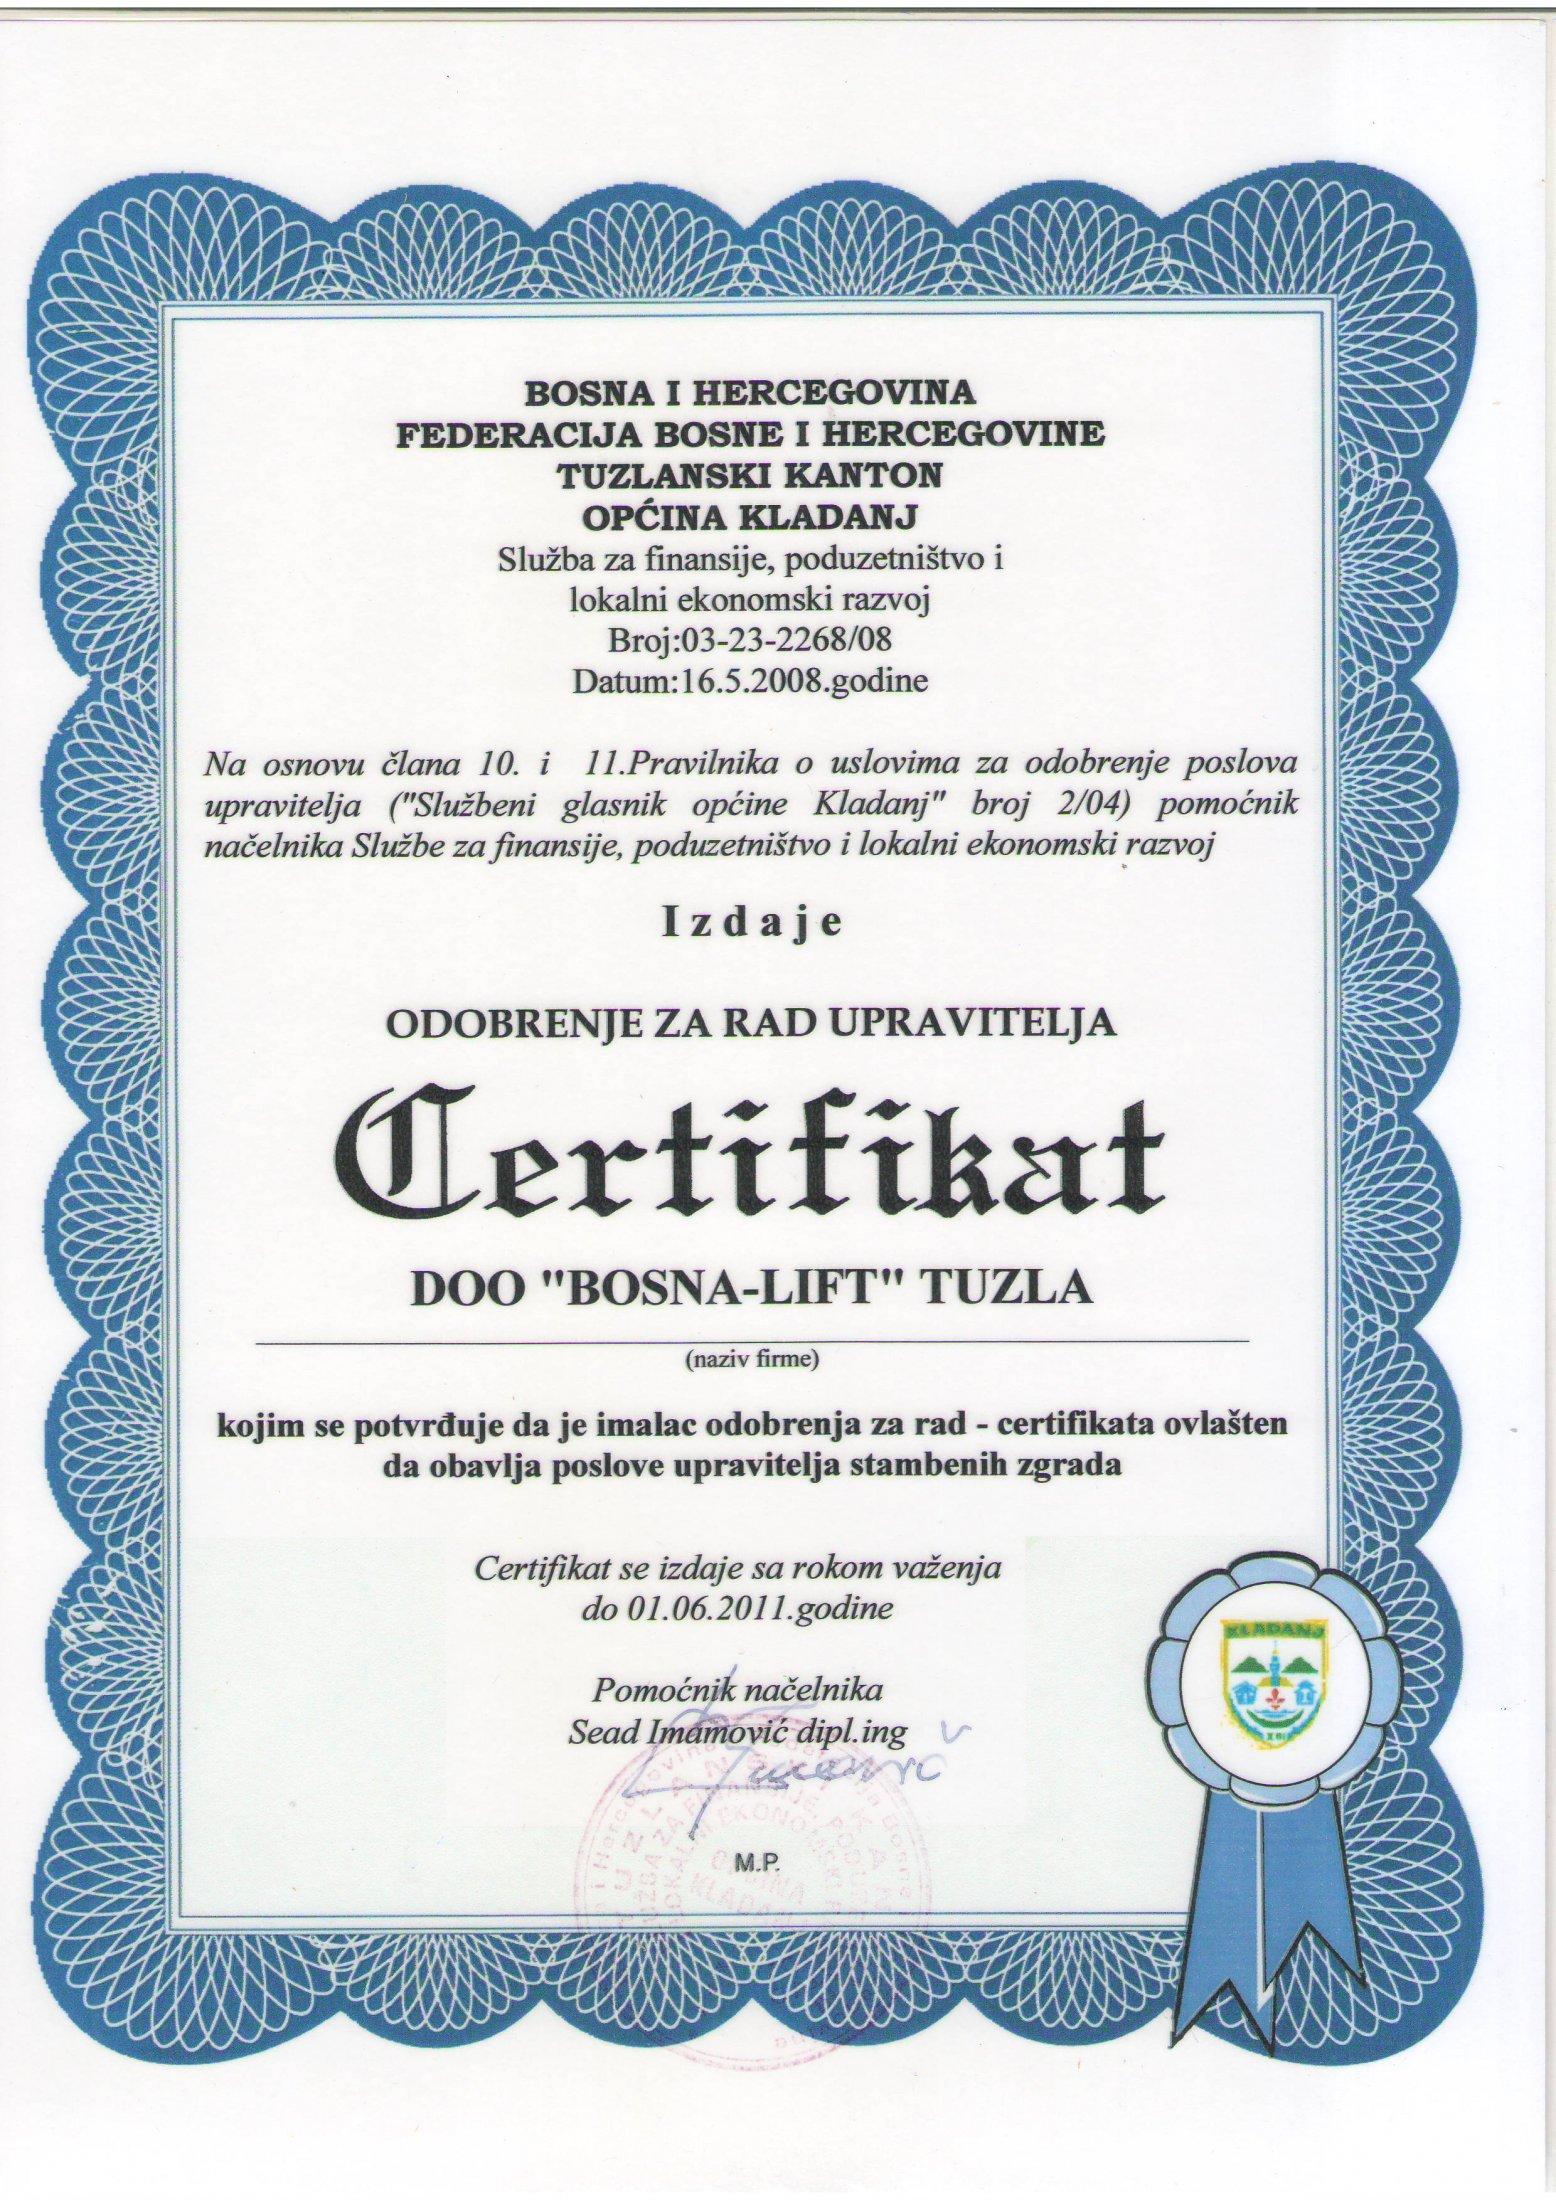 Certifikat - Općina Kladanj